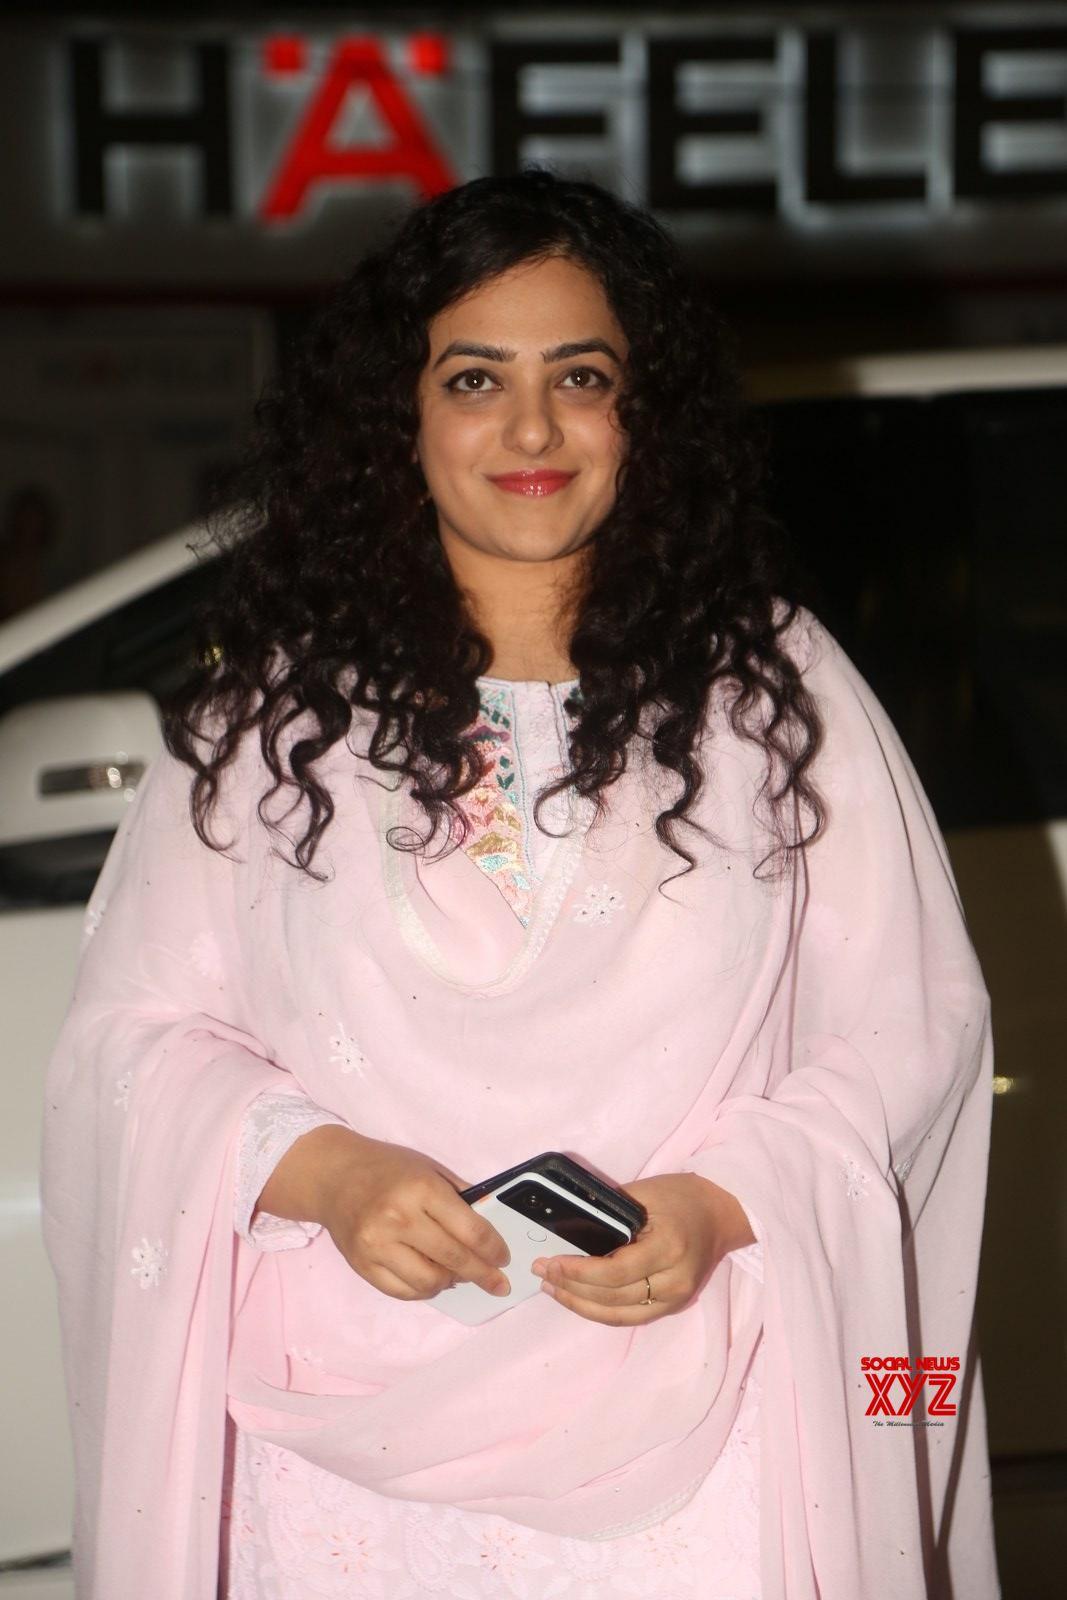 actress nithya menon stills from gaze art show - social news xyz